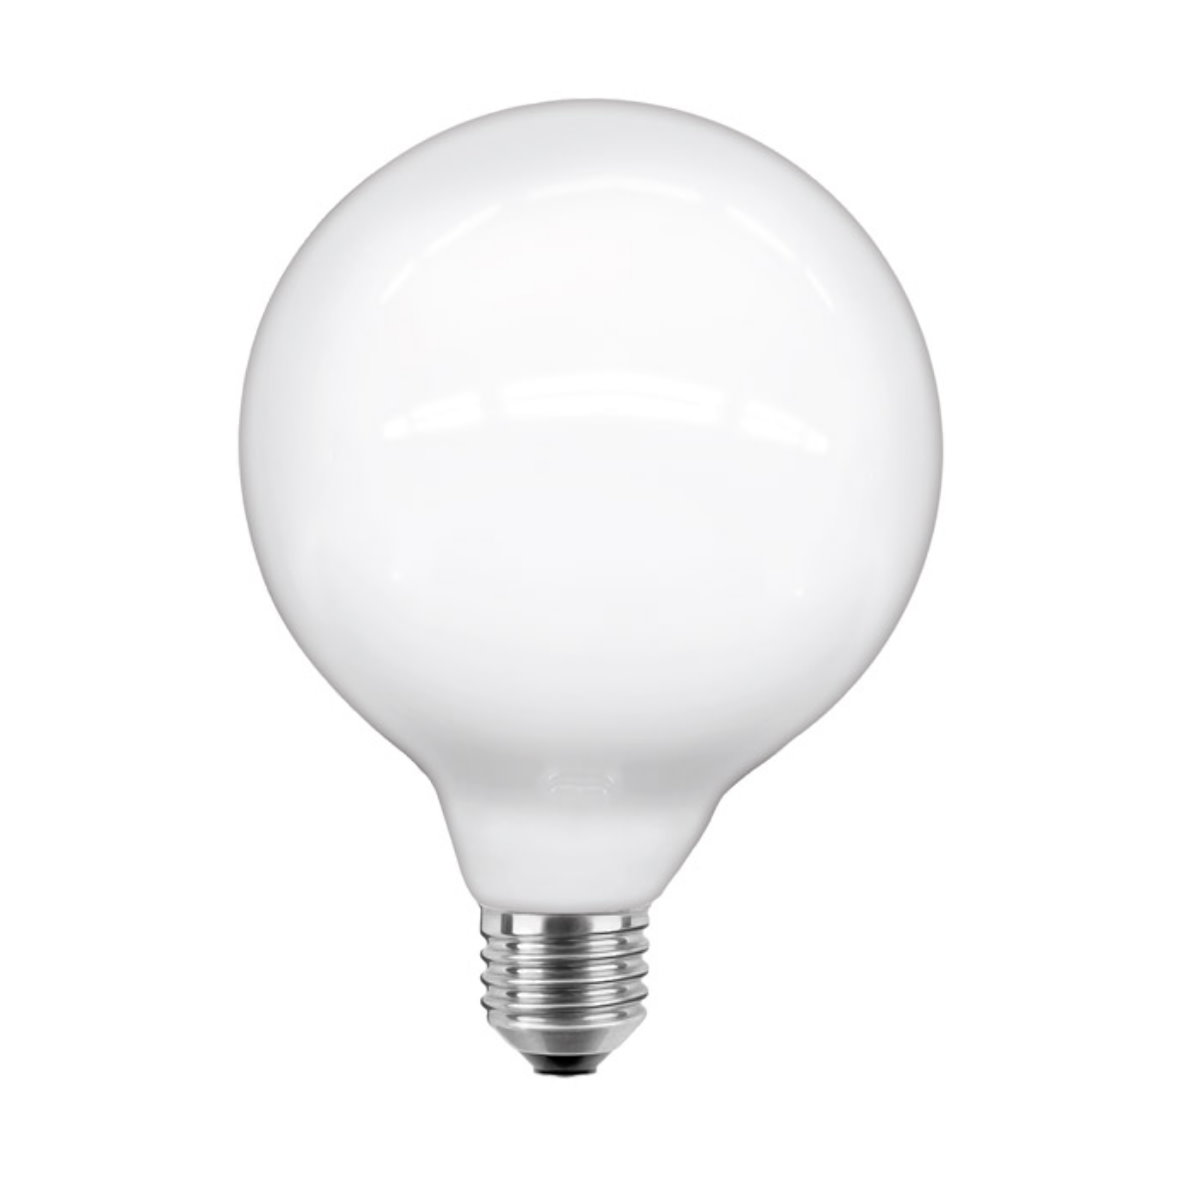 segula led smd birne rund e14 e27 leuchtmittel dimmbar dimmable lampe bulb 230v ebay. Black Bedroom Furniture Sets. Home Design Ideas